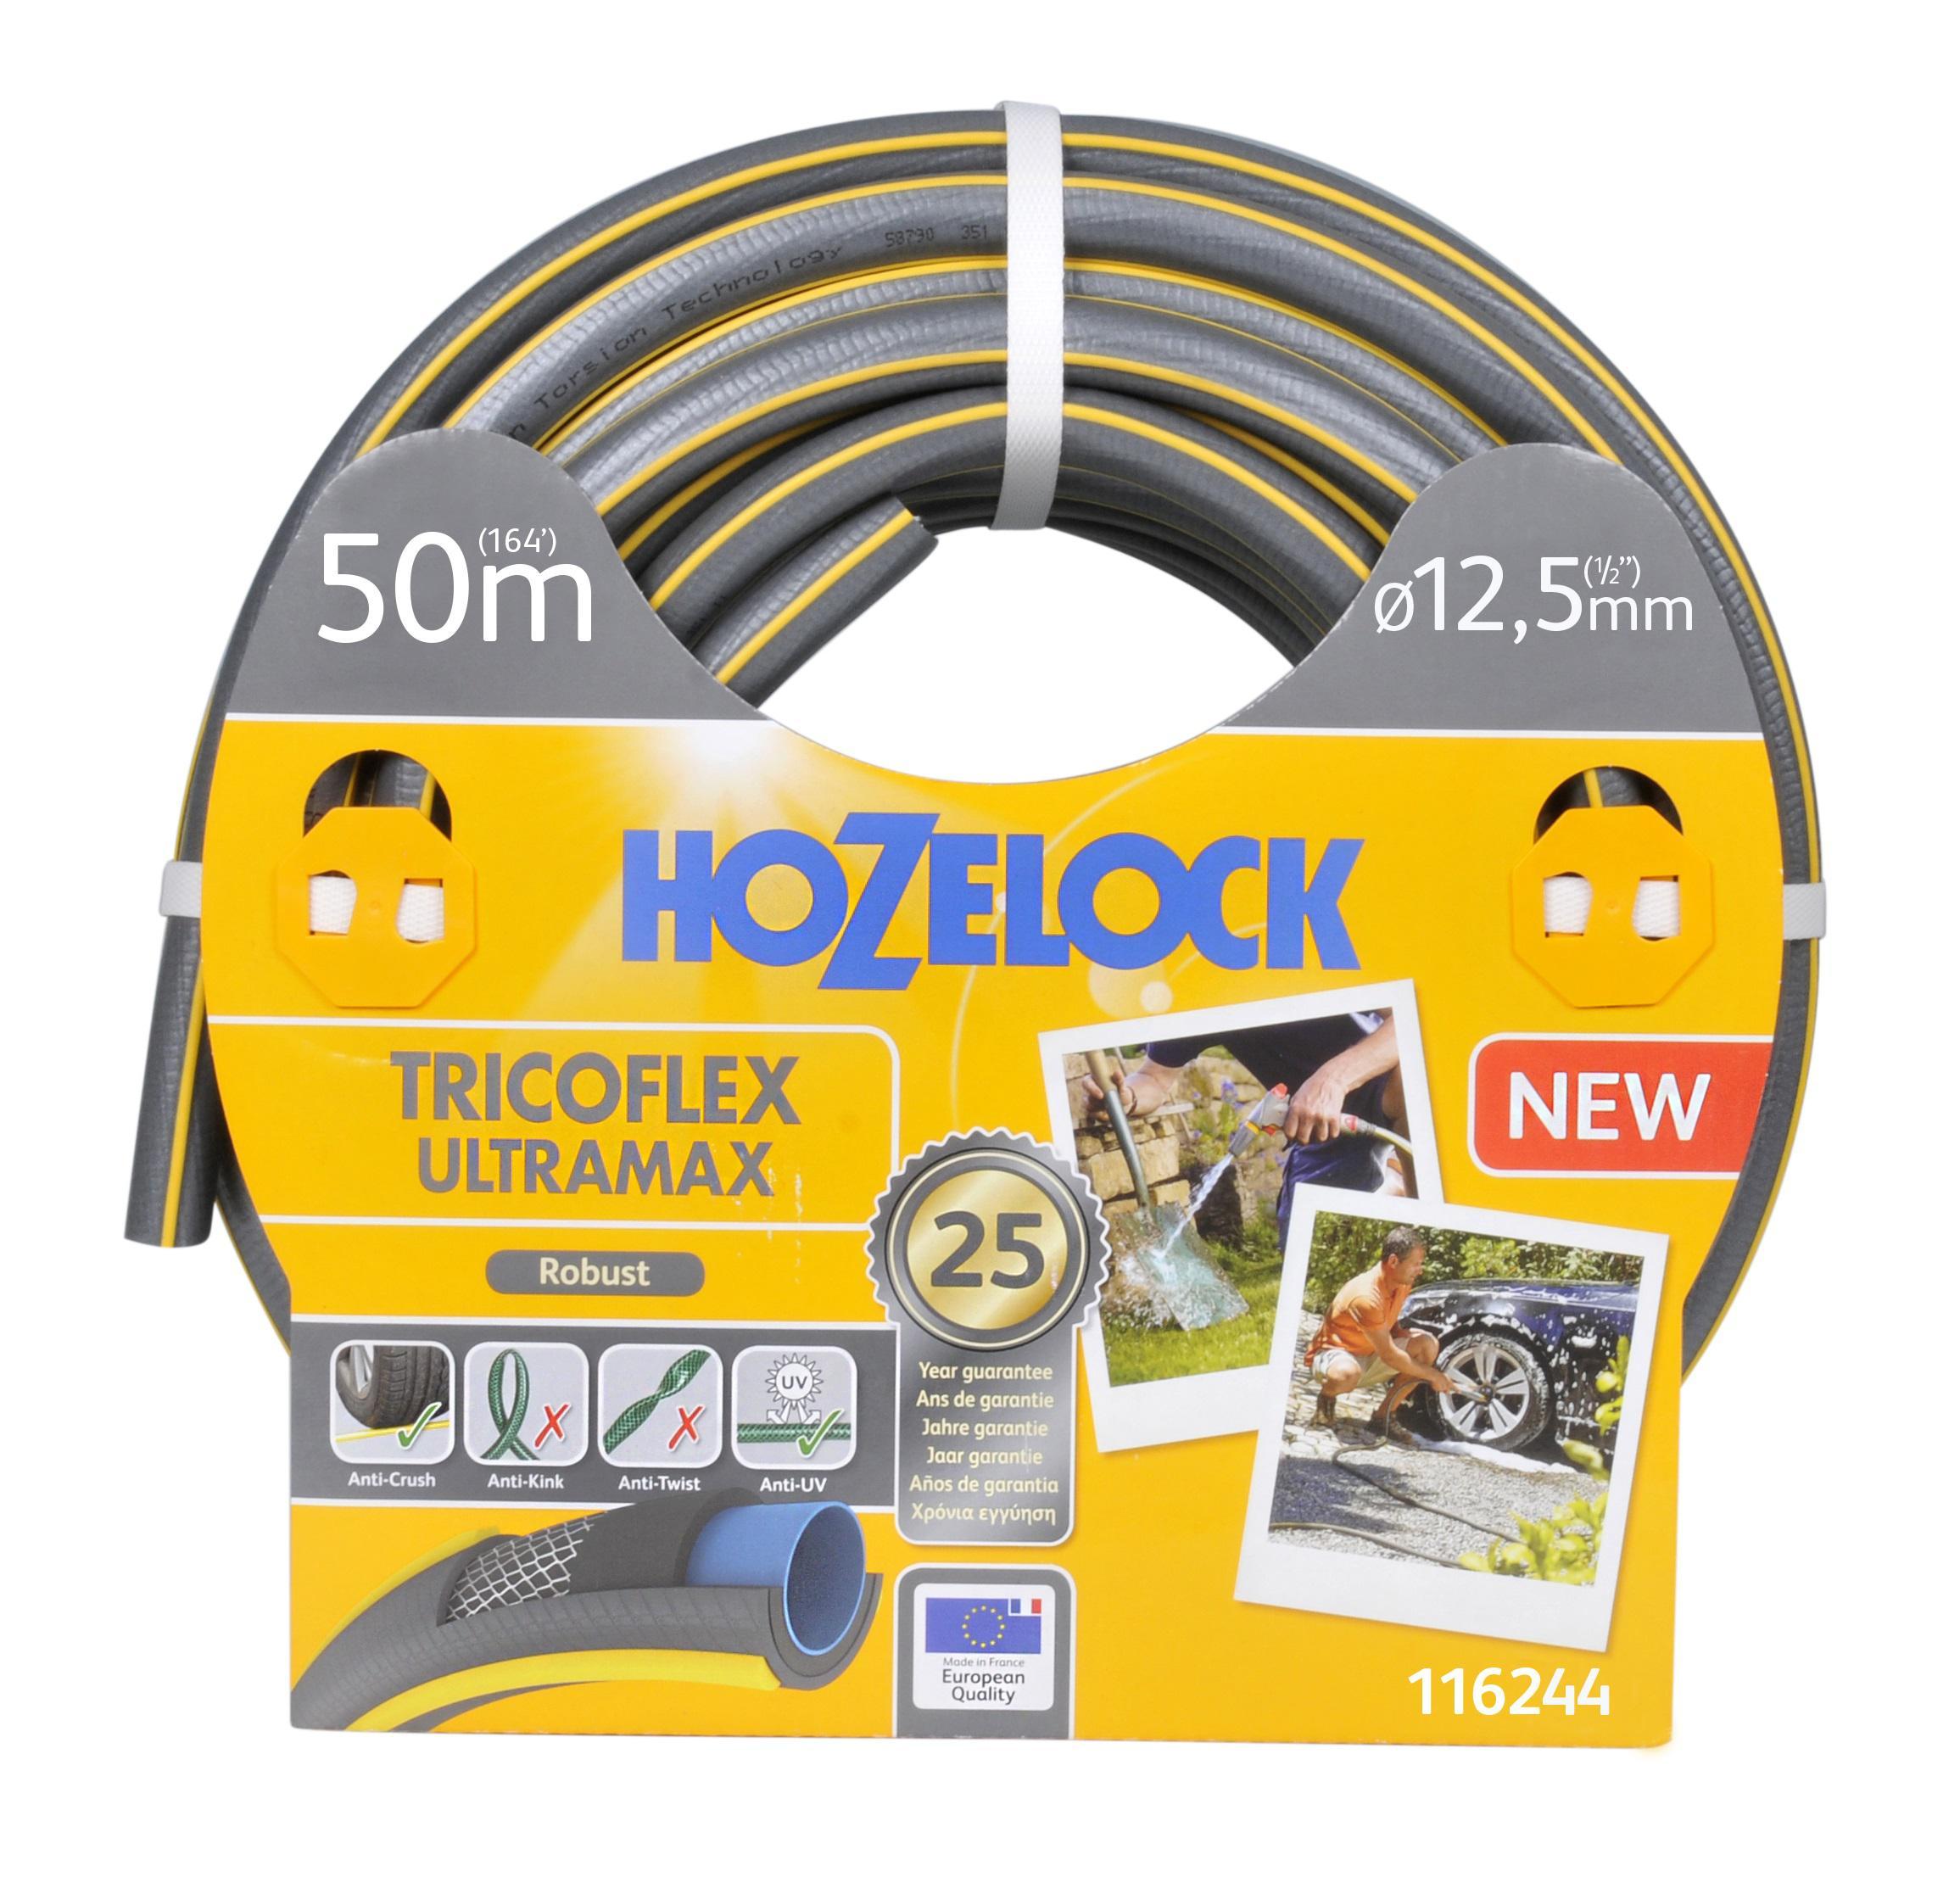 Шланг Hozelock 116244 tricoflex ultramax цена